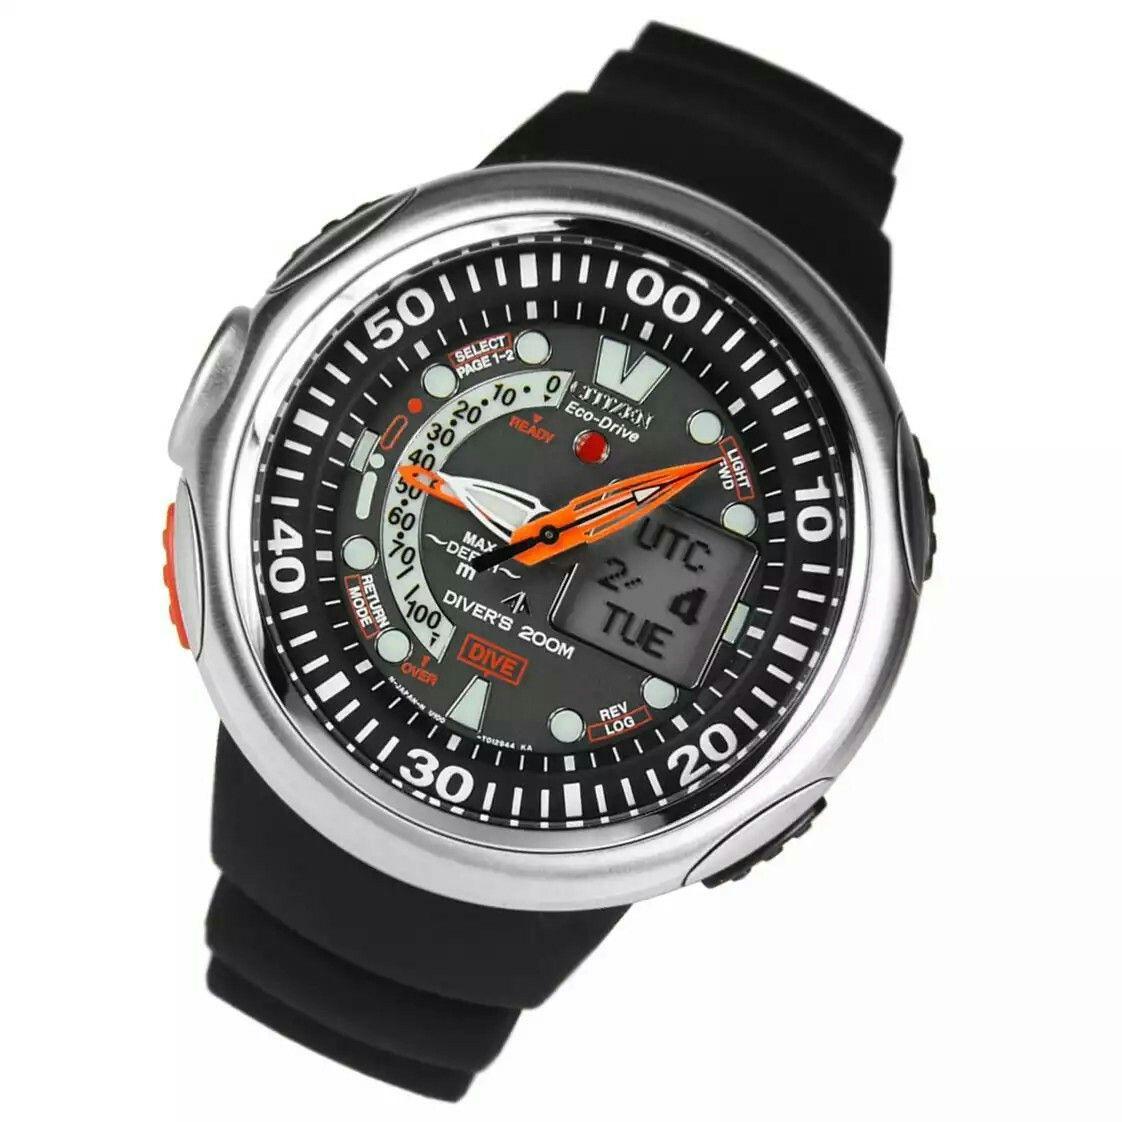 638ceeaf532 Citizen Promaster Aqualand Eco Drive Dive Watch JV0000 01E JV0000 ...